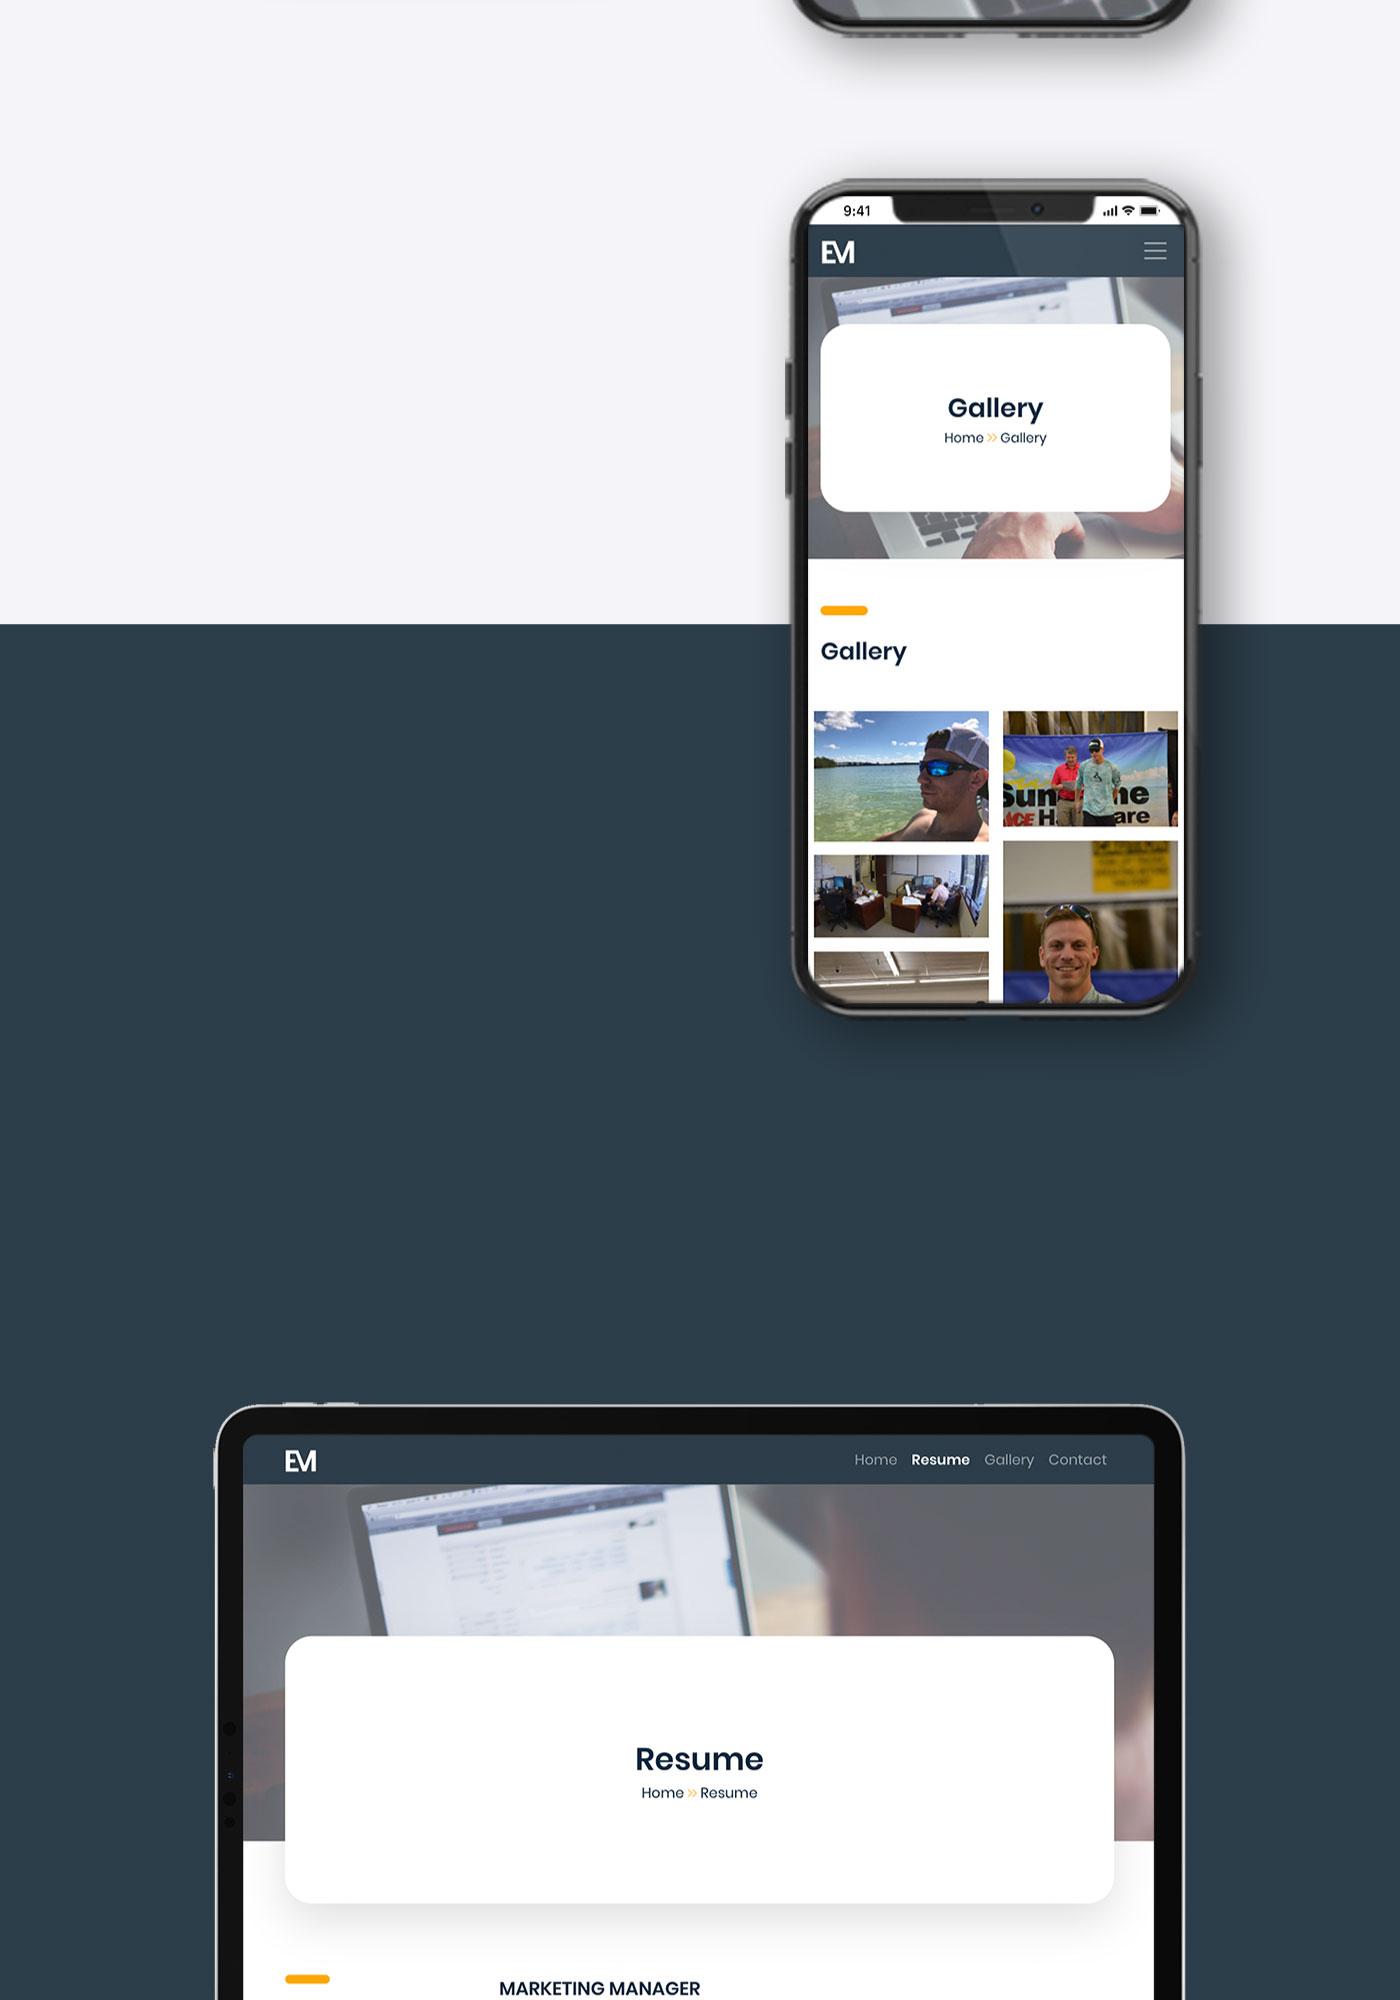 Evan Moshinsky mockup shown on iPhone and iPad